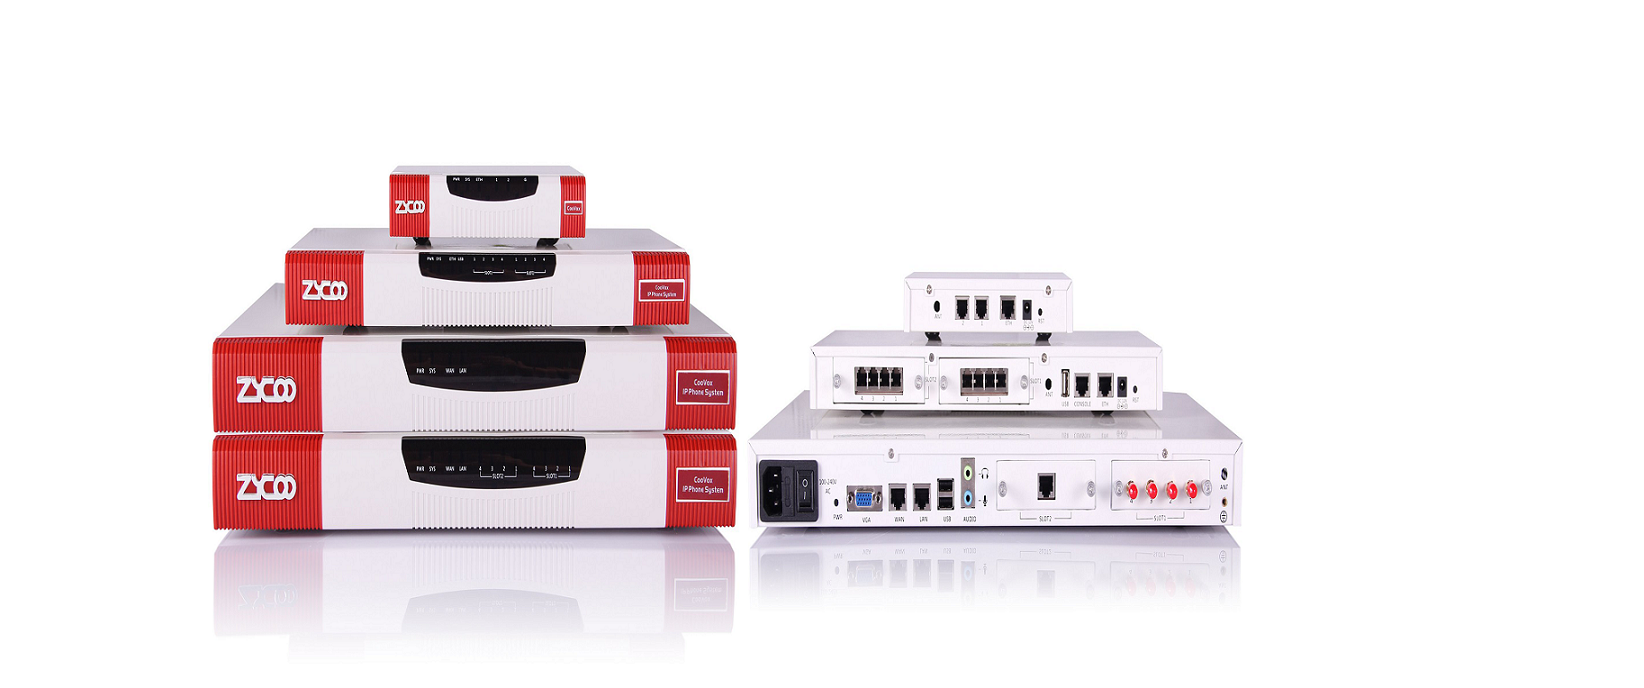 Panasonic pbx installation | PABX System Dubai | NEC PABX